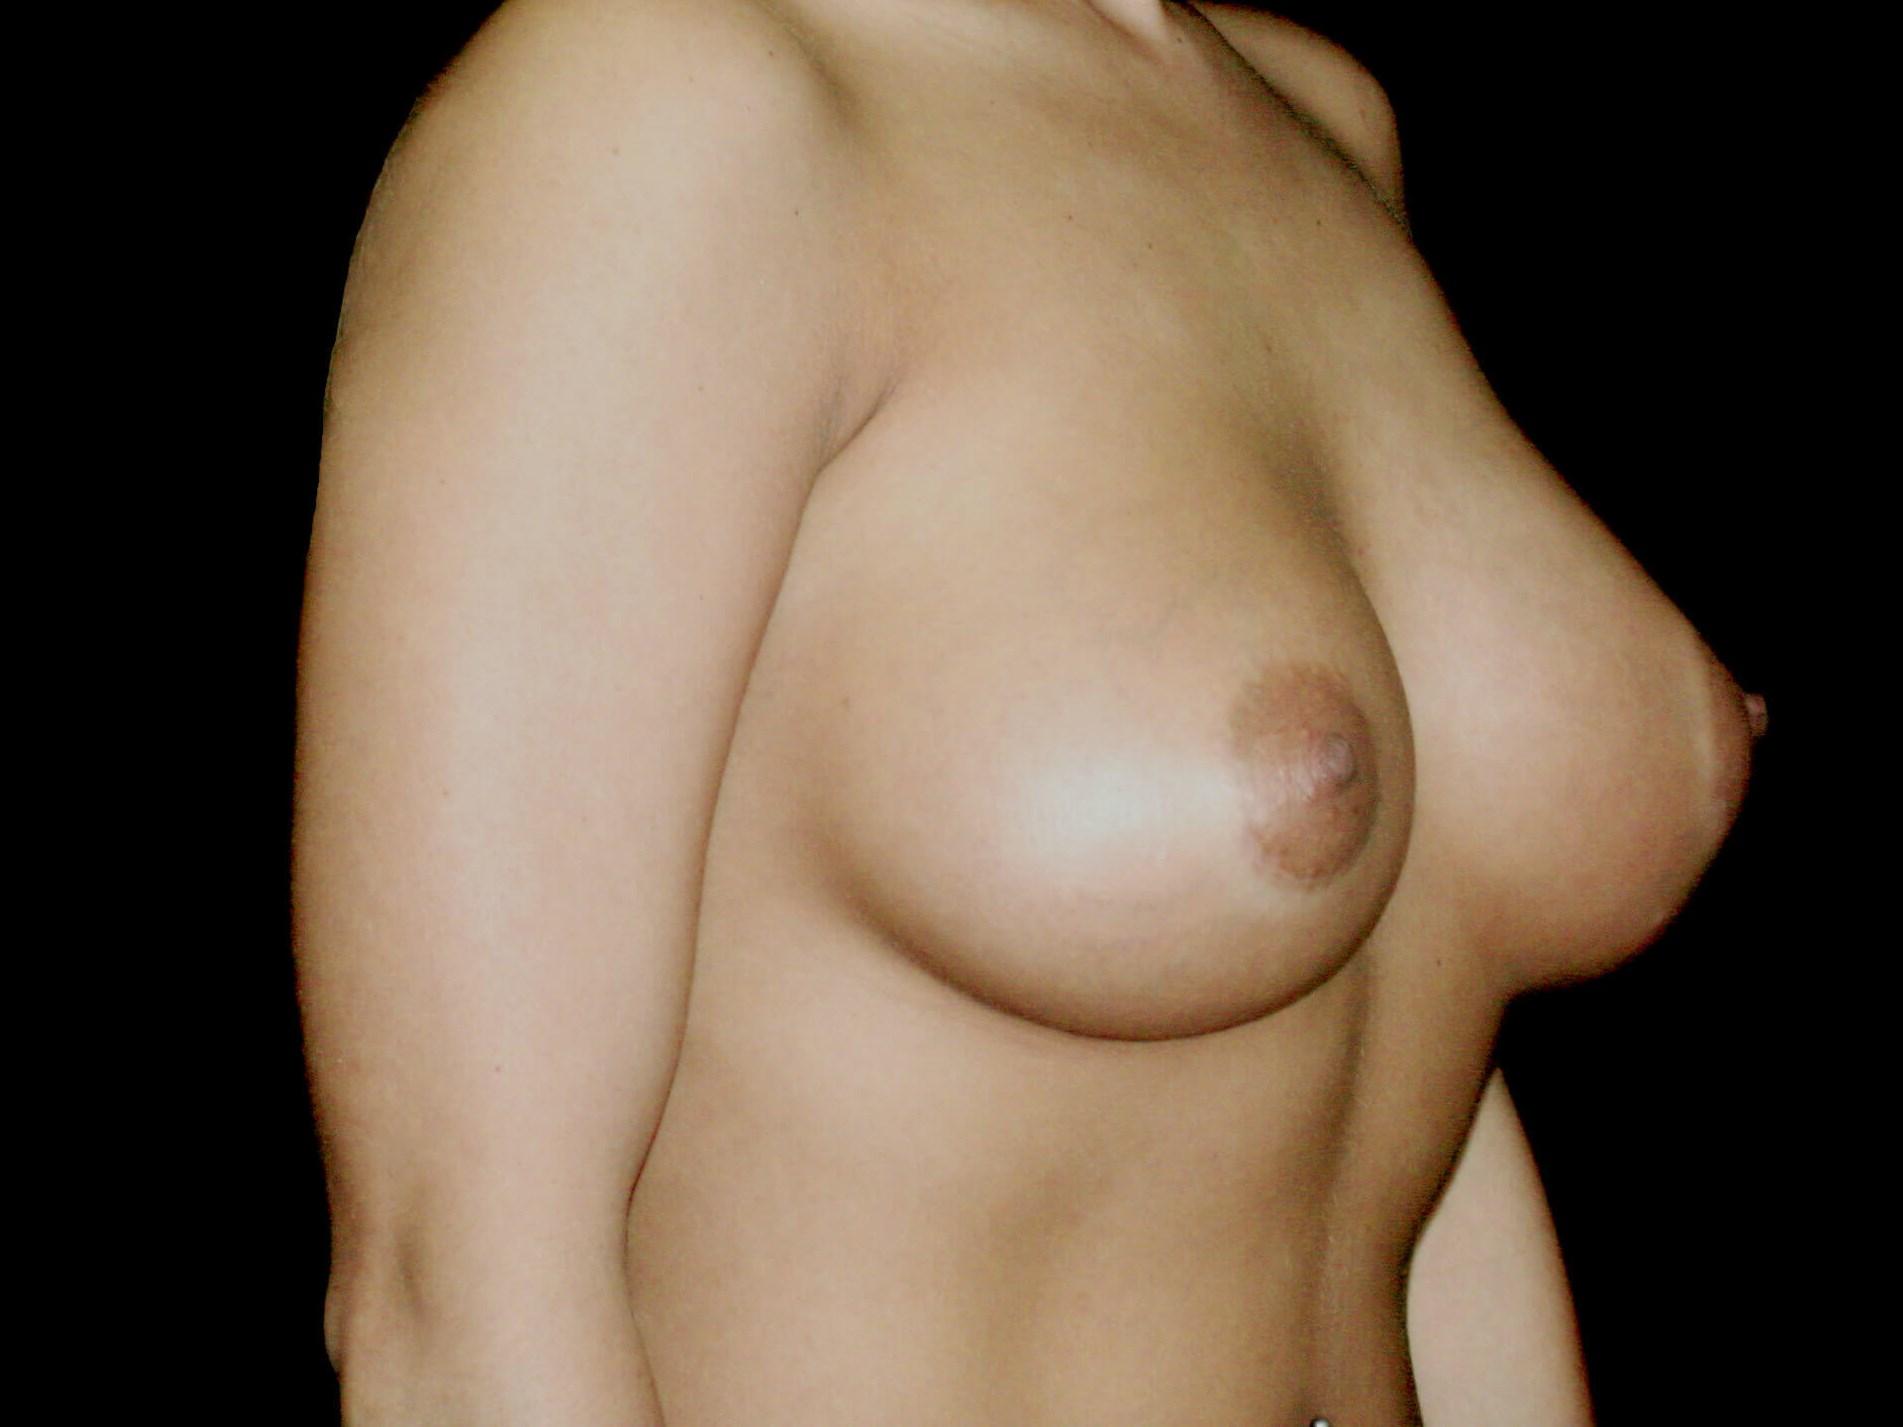 DALLAS, TEXAS WOMAN HAS BREAST AUGMENTATION PROCEDURE WITH GUMMY BEAR IMPLANTS